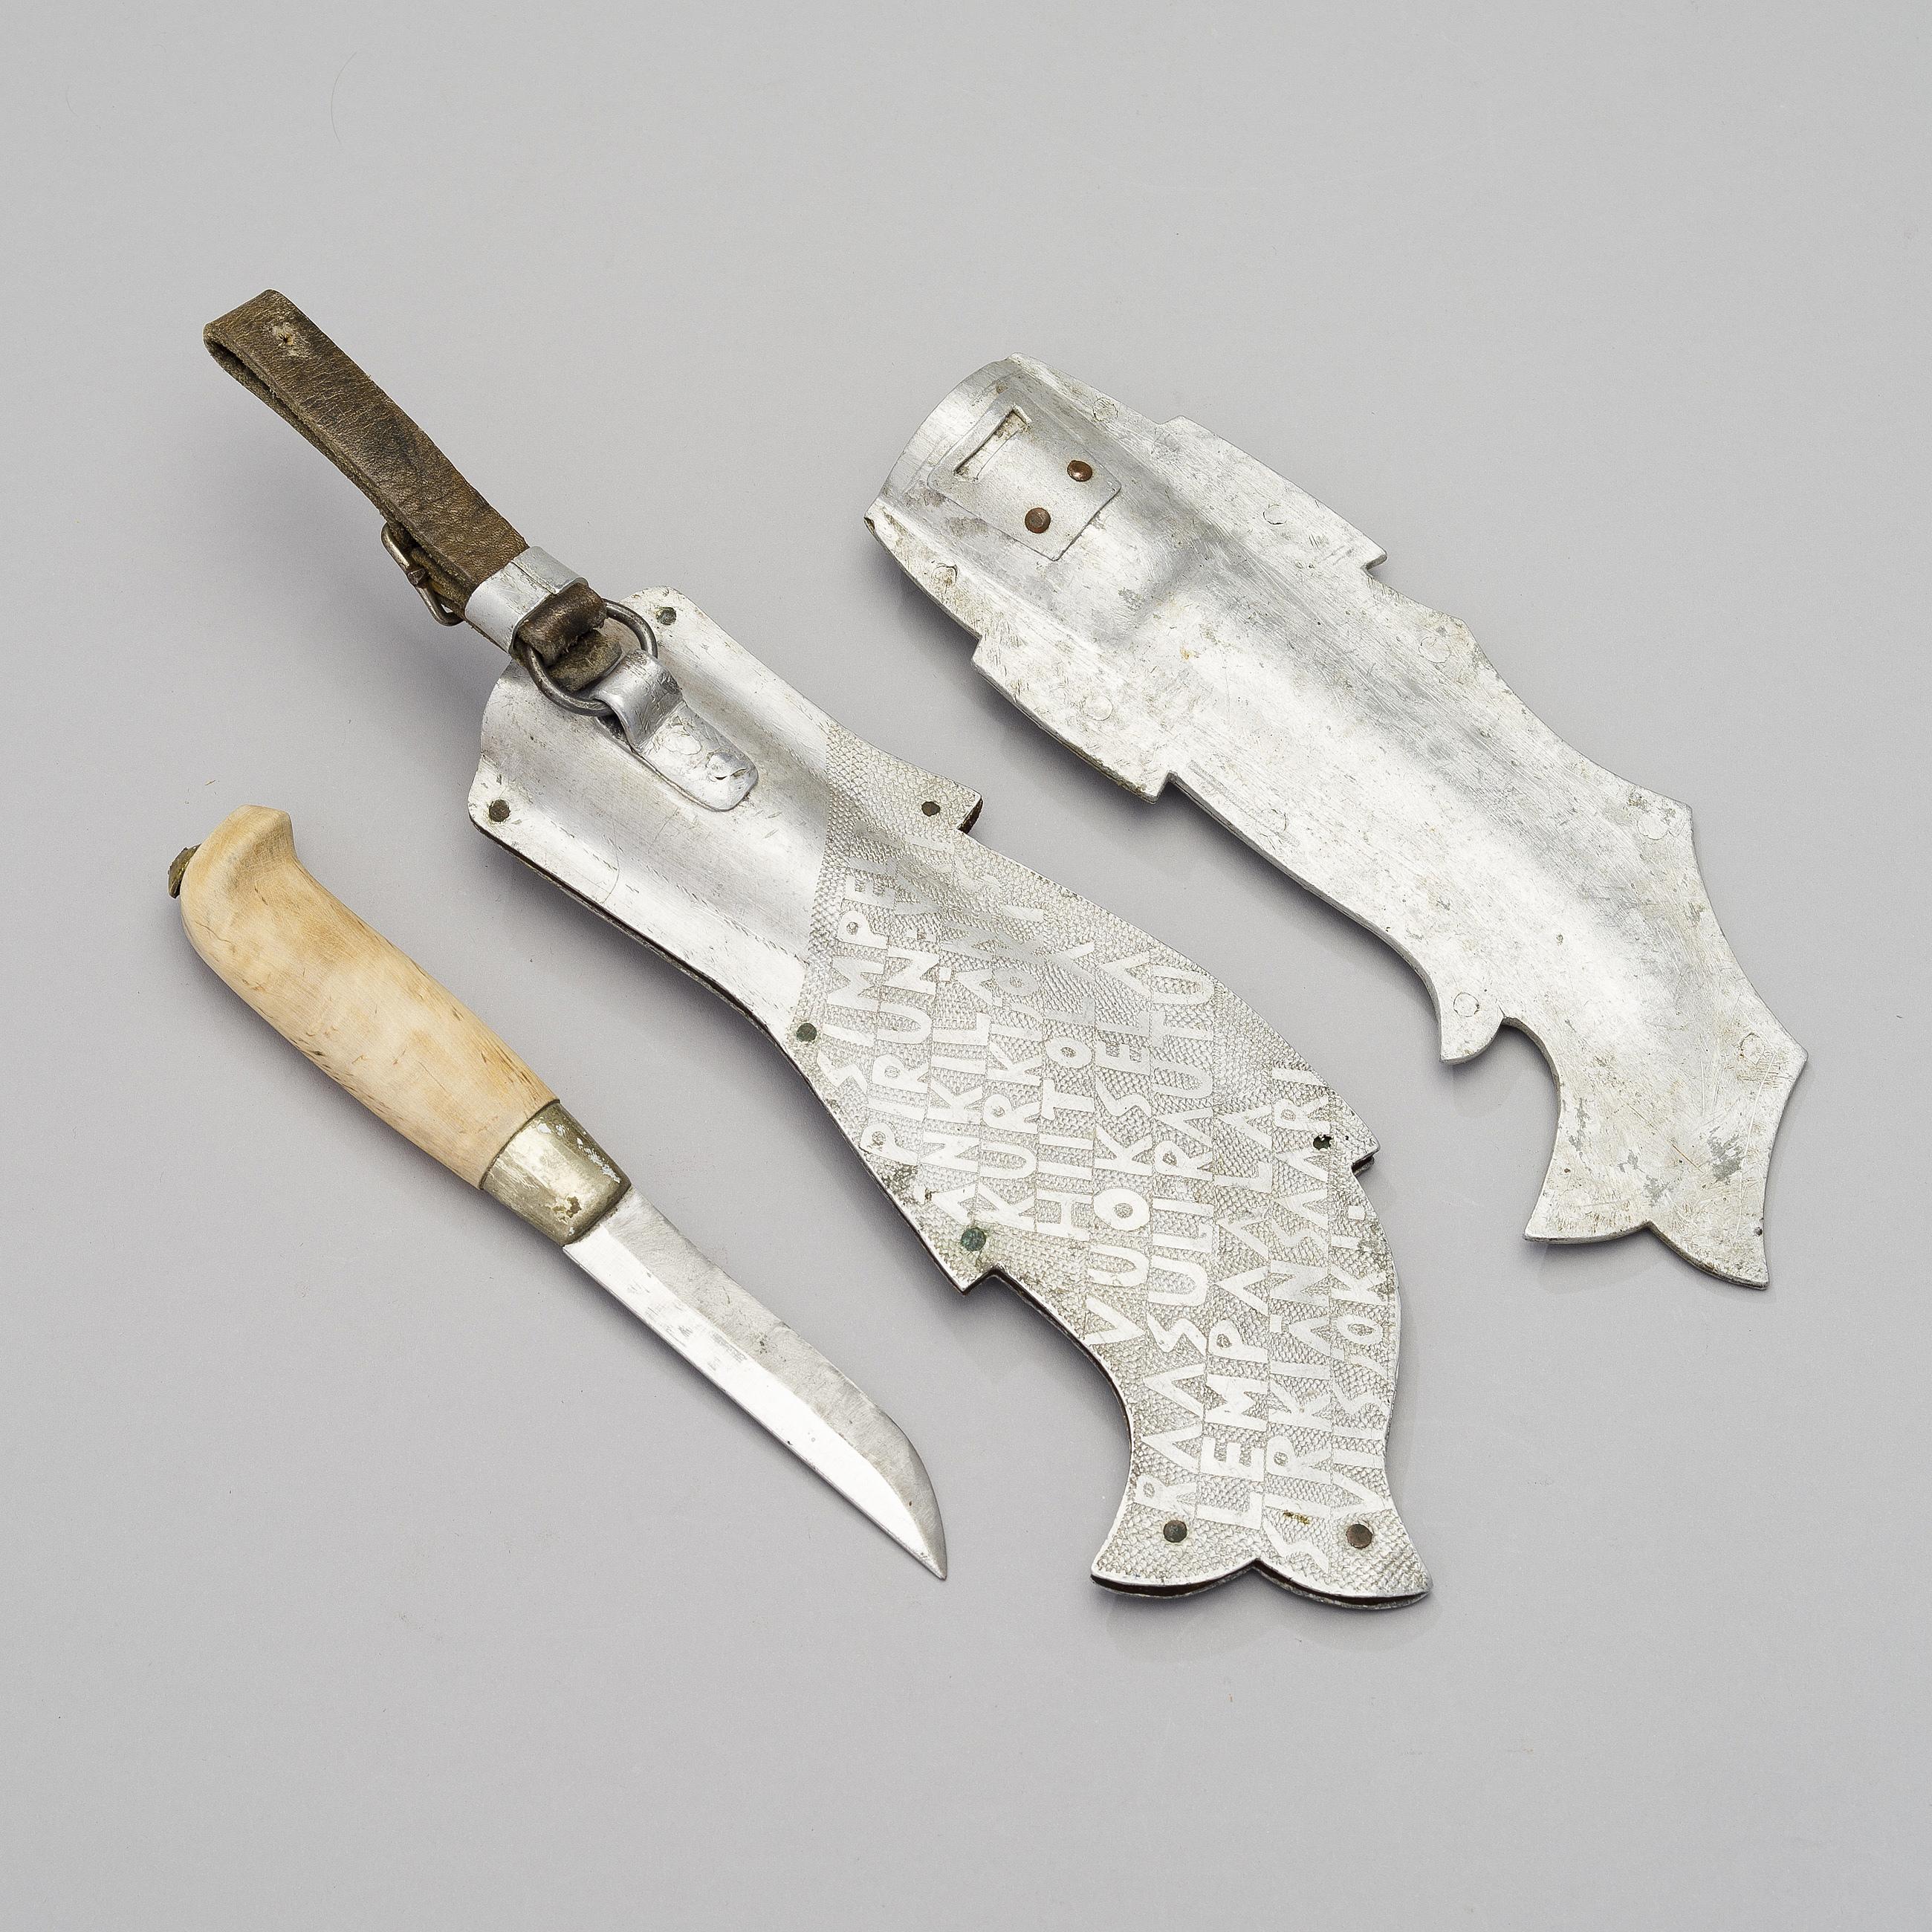 A Finnish Marttiini knife and two WW II sheaths of the 1940s